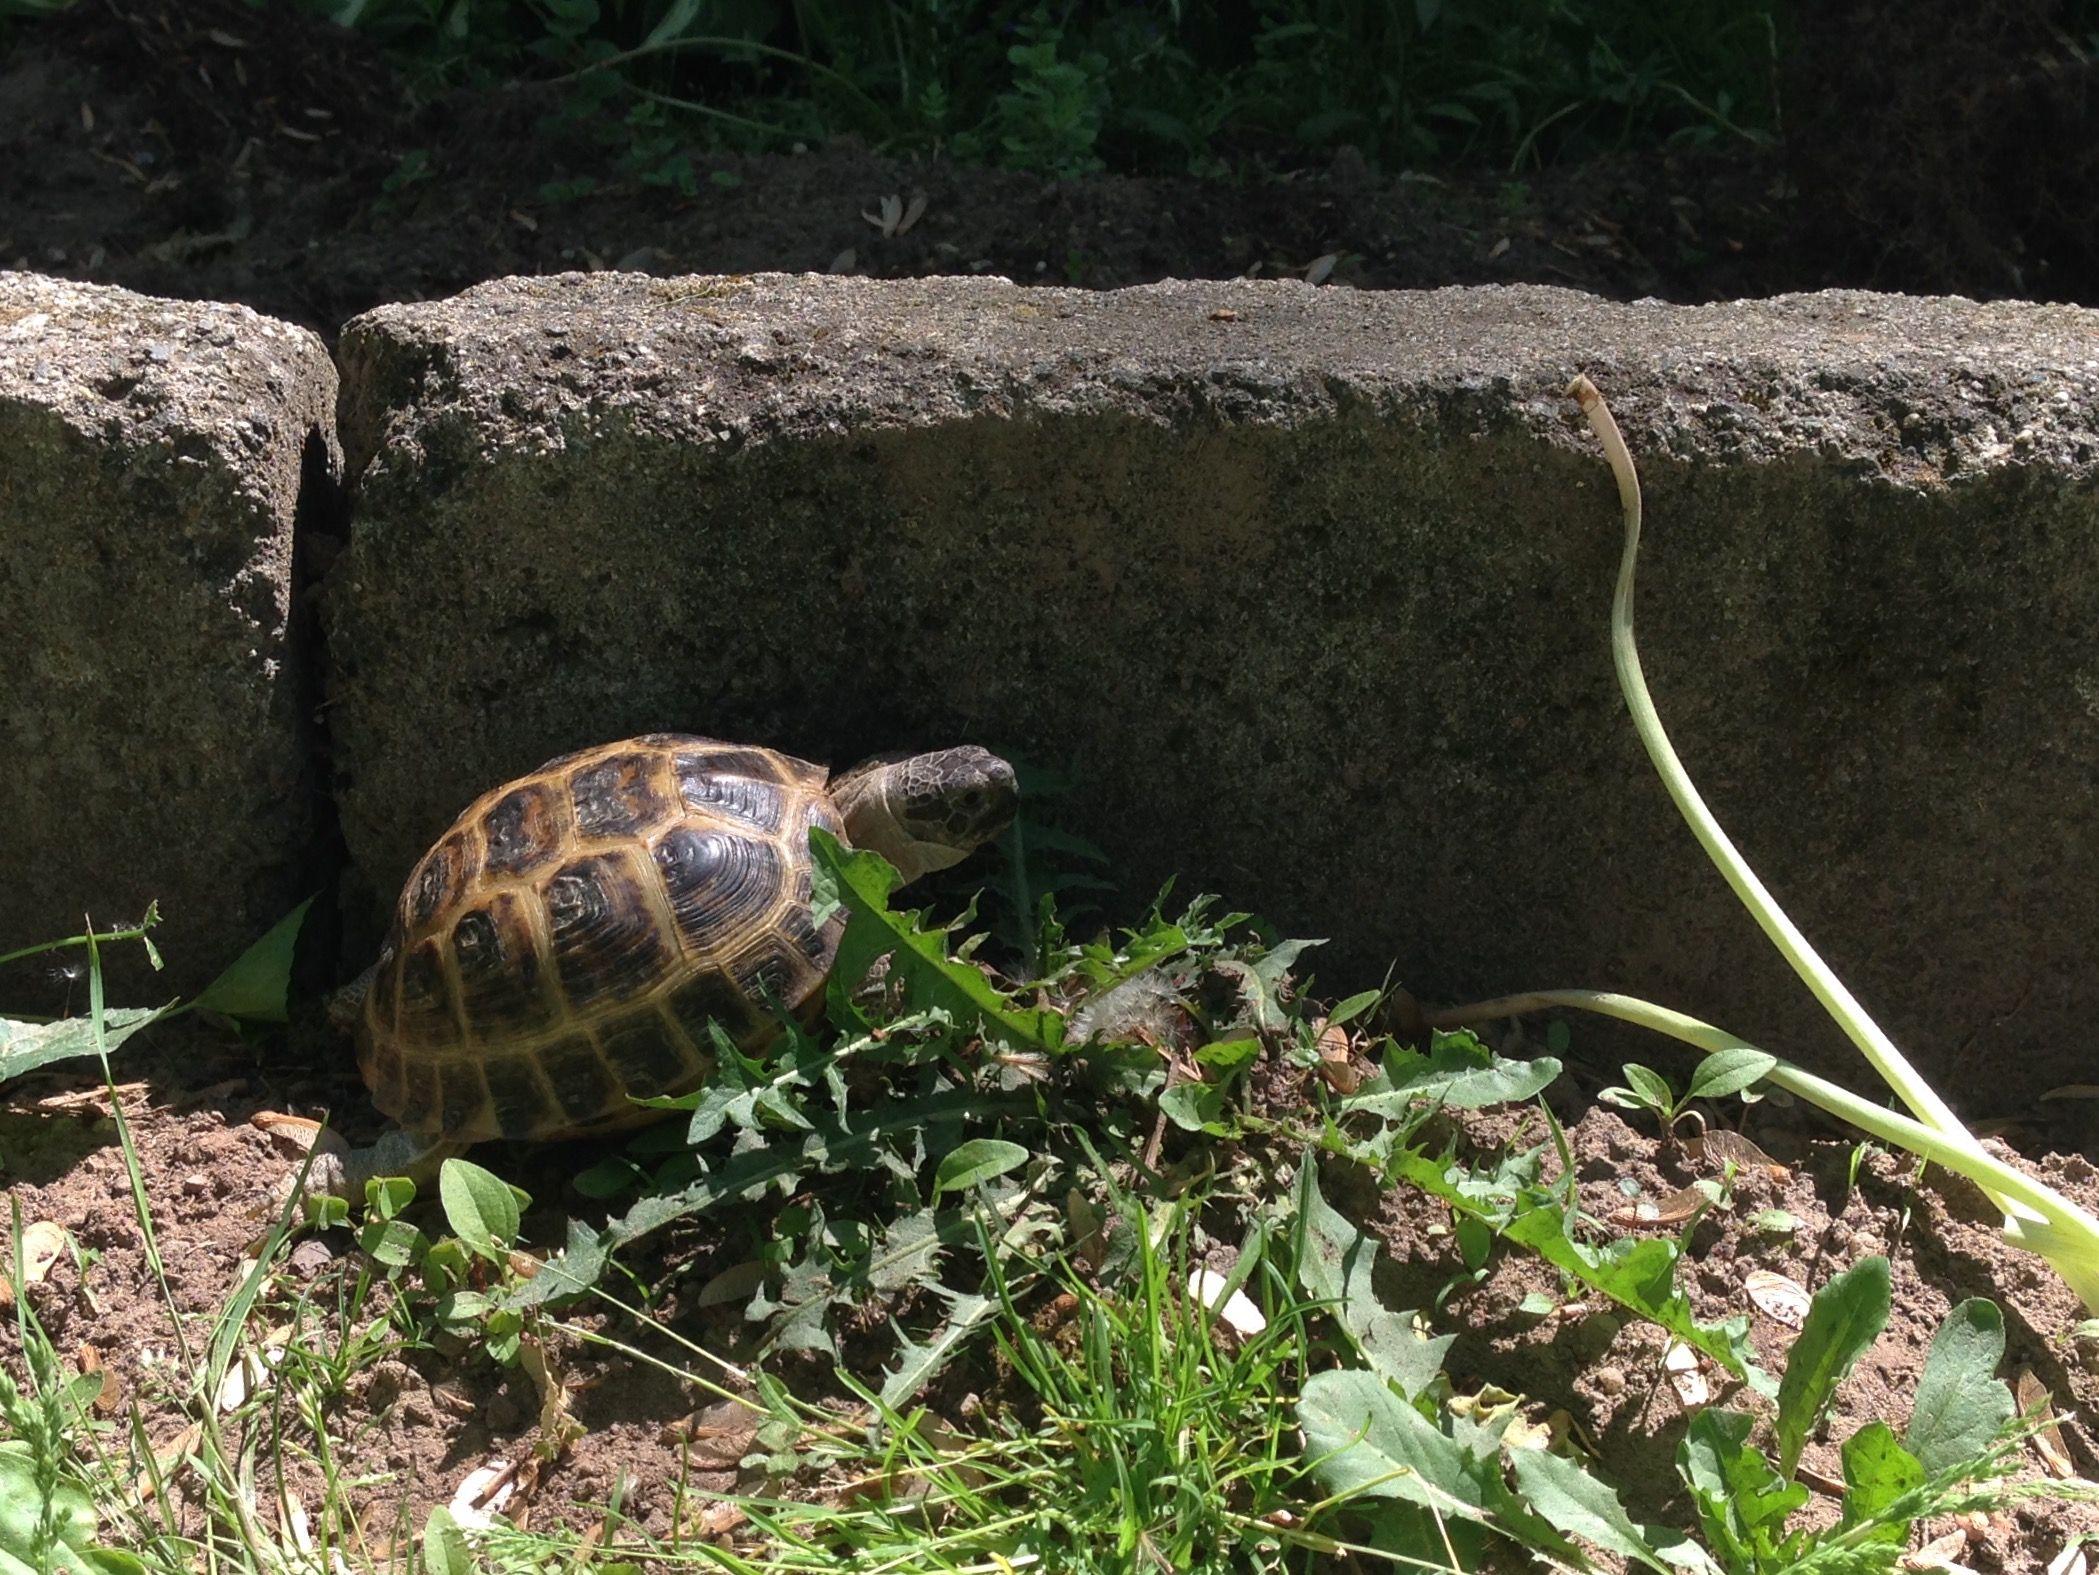 Fester strolling along the rock wall tortoise n turtles